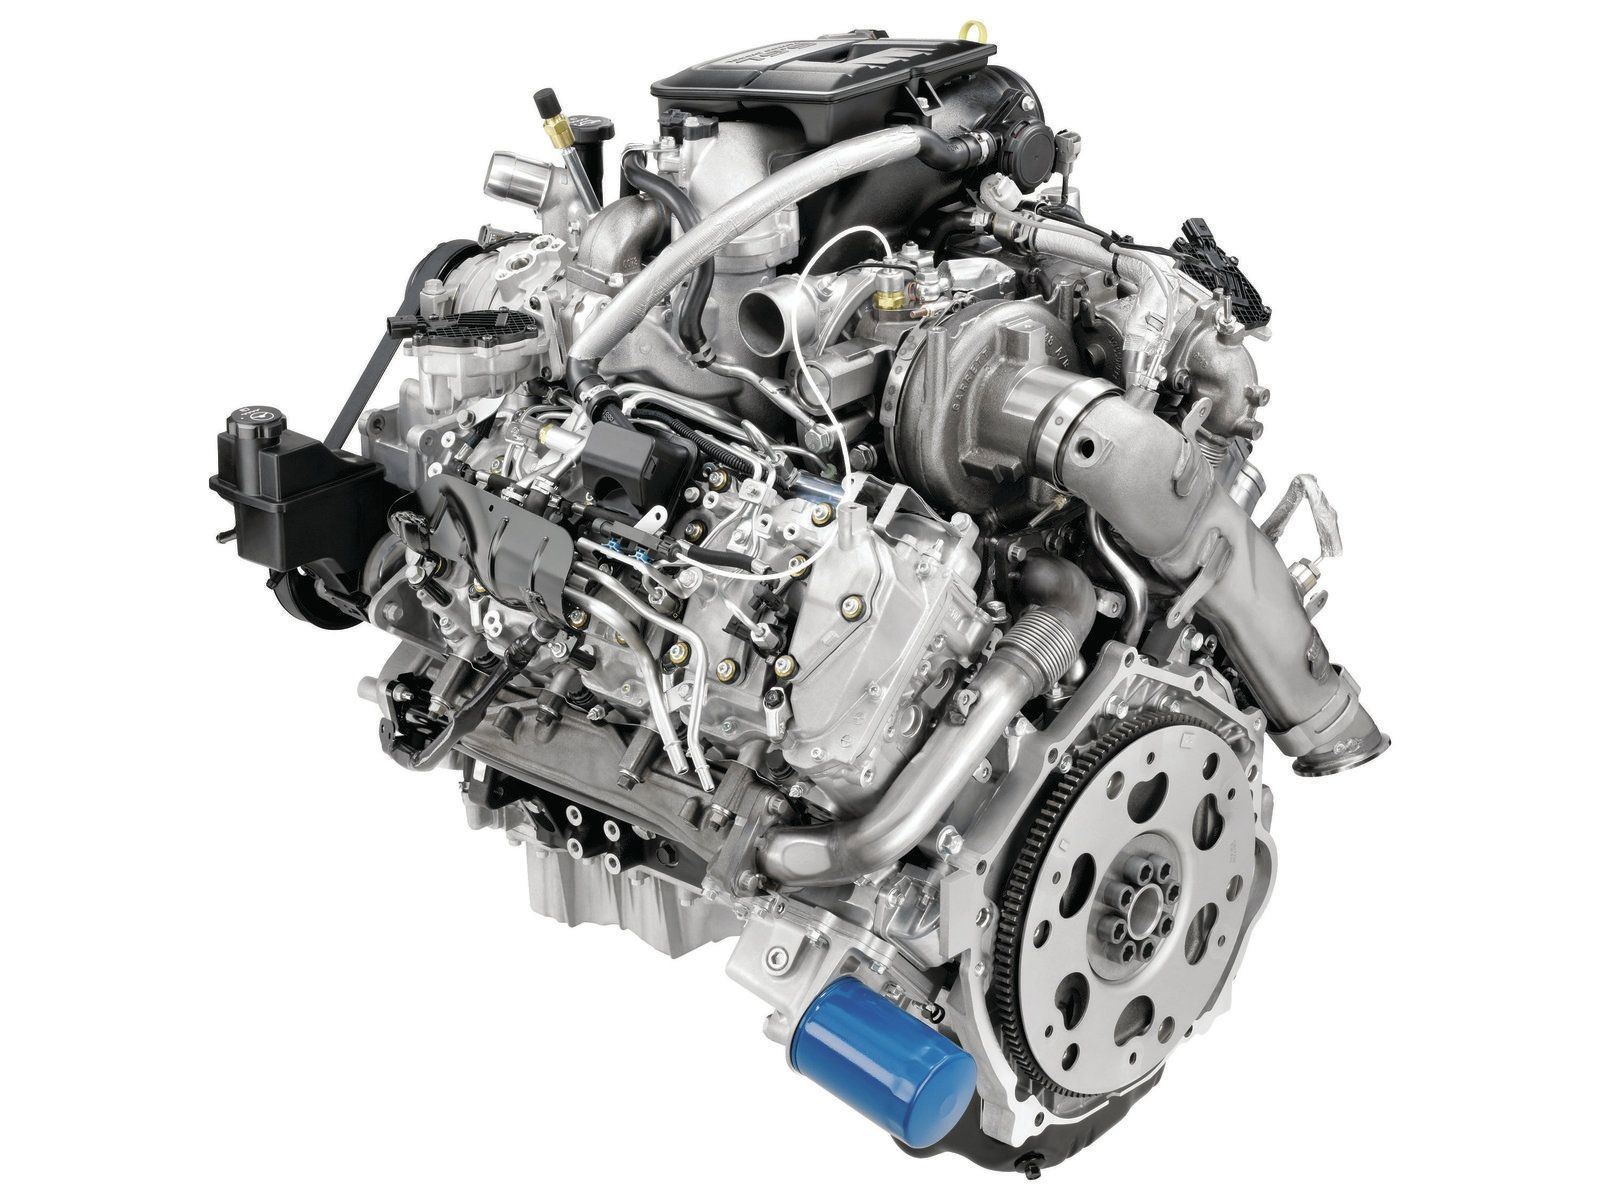 Duramax Diesel Engine Diagram History Of the Duramax Diesel Engine & Image Gallery Of Duramax Diesel Engine Diagram